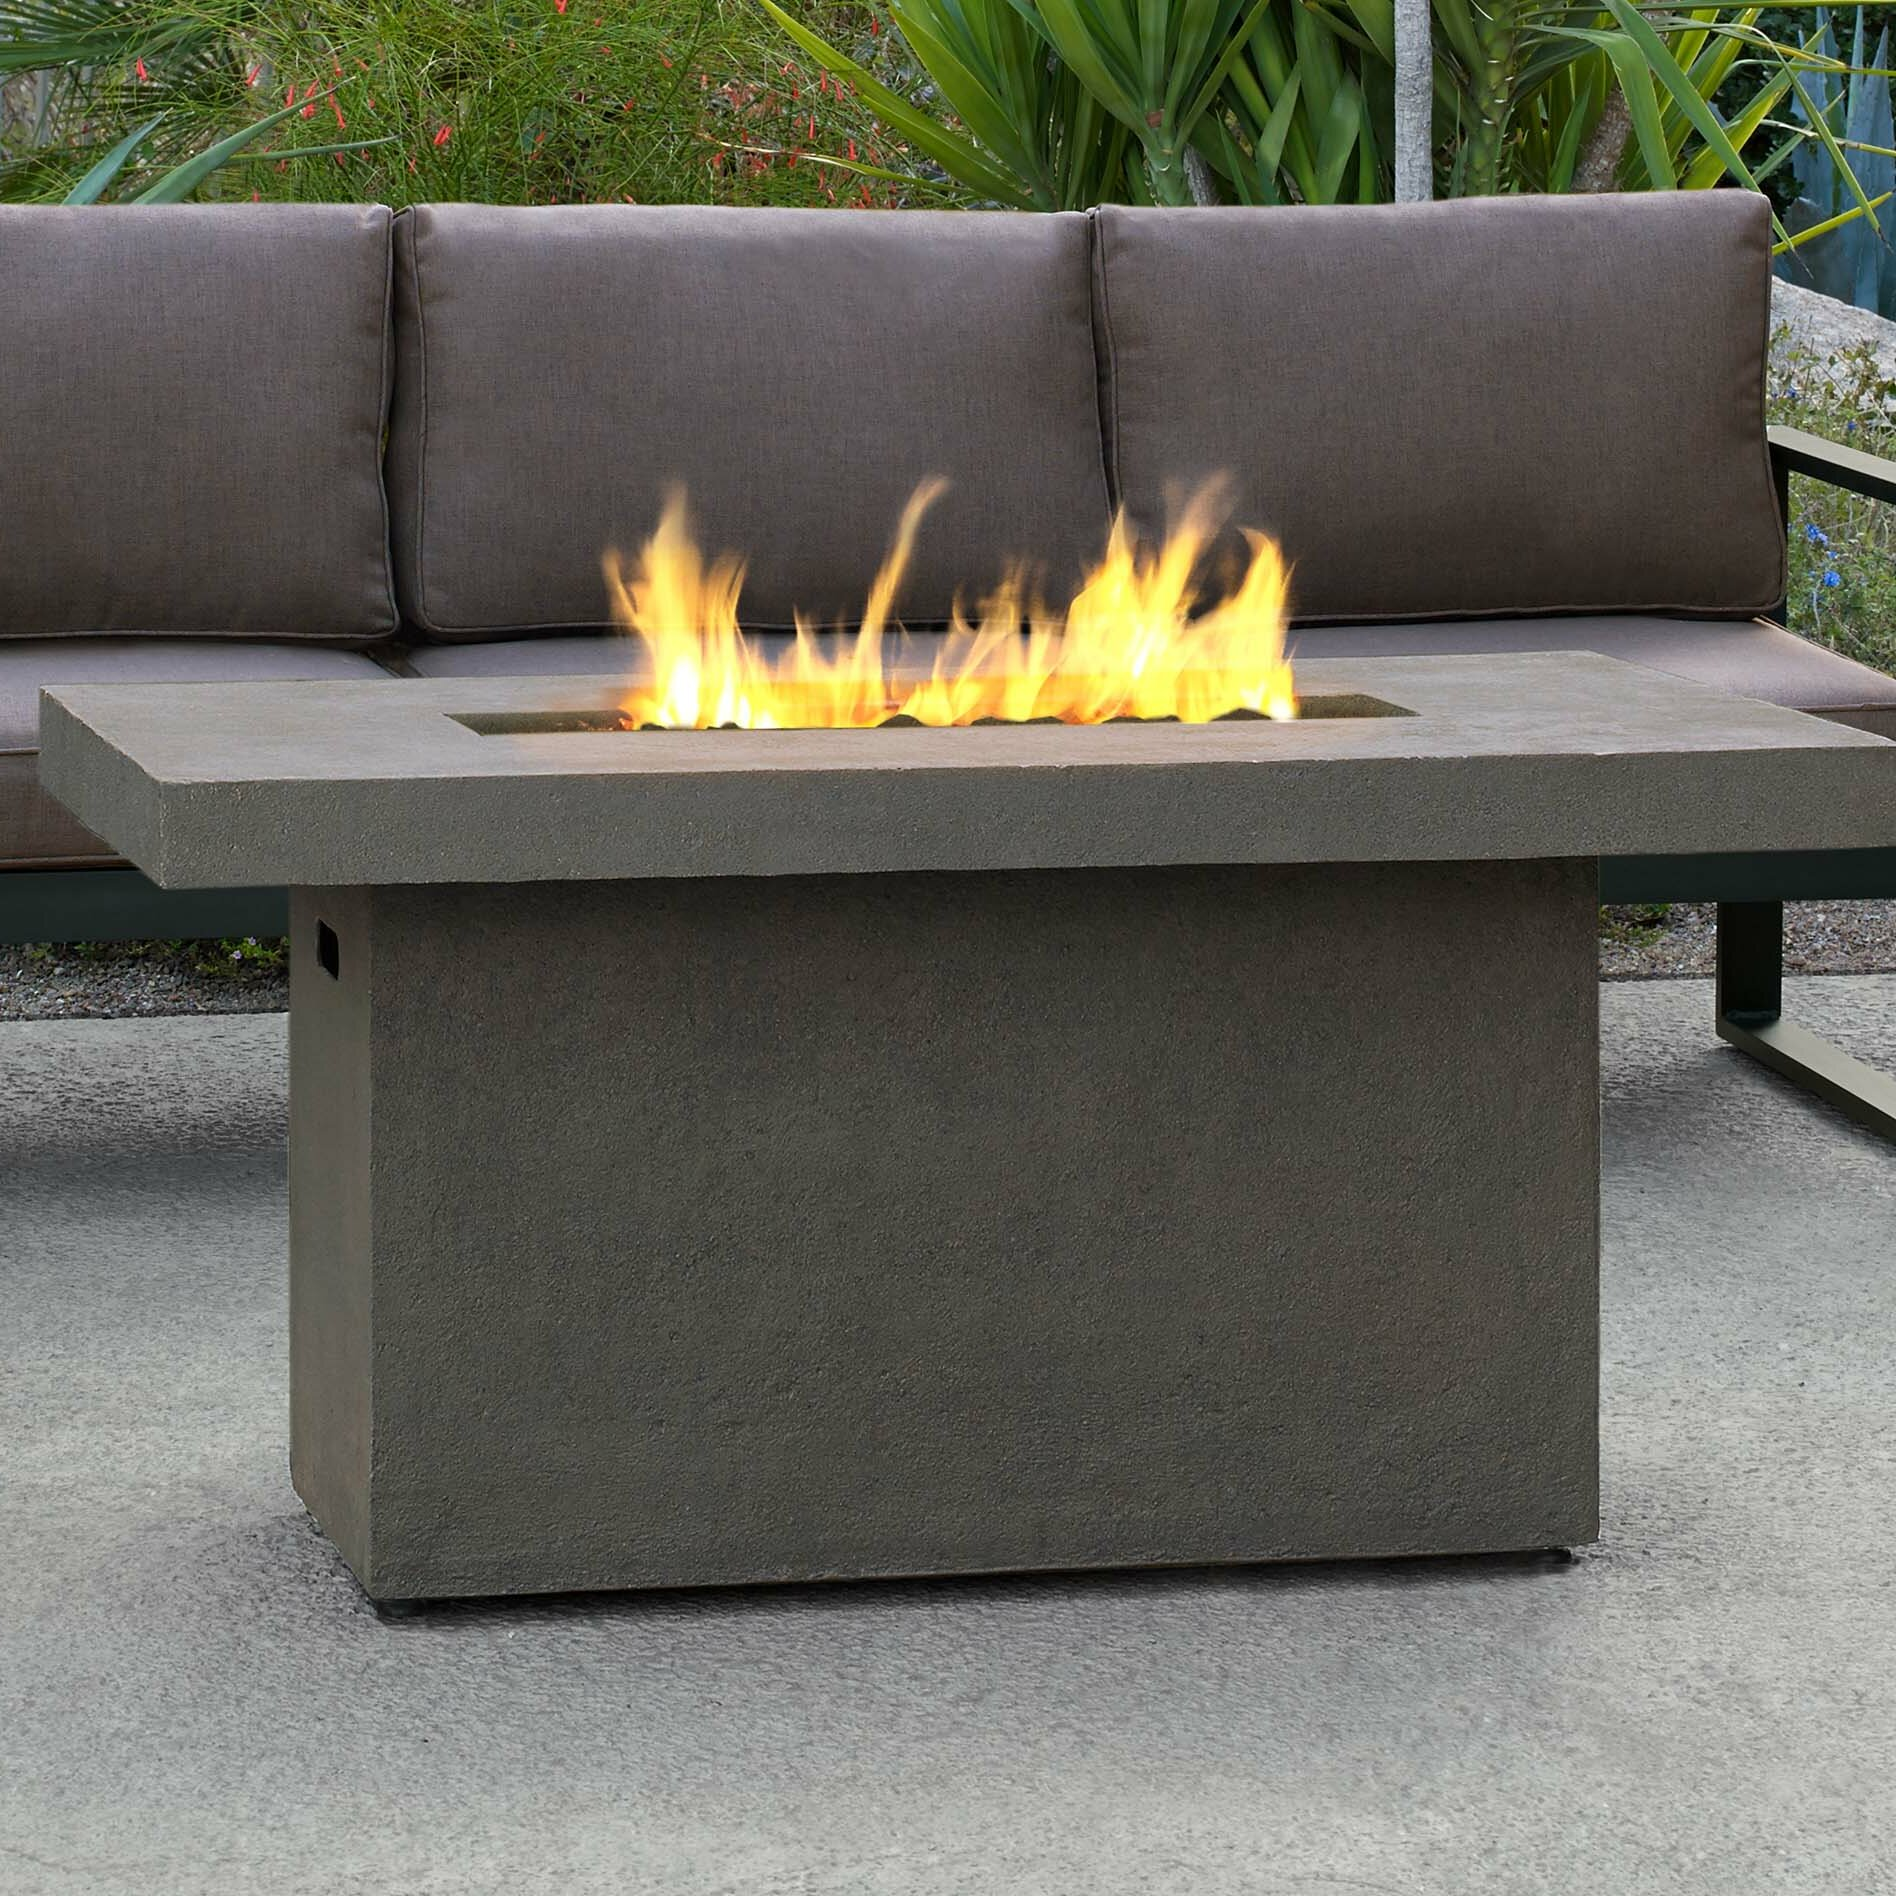 Real Flame Ventura Concrete Propane Gas Fire Pit Table Reviews Wayfair Ca